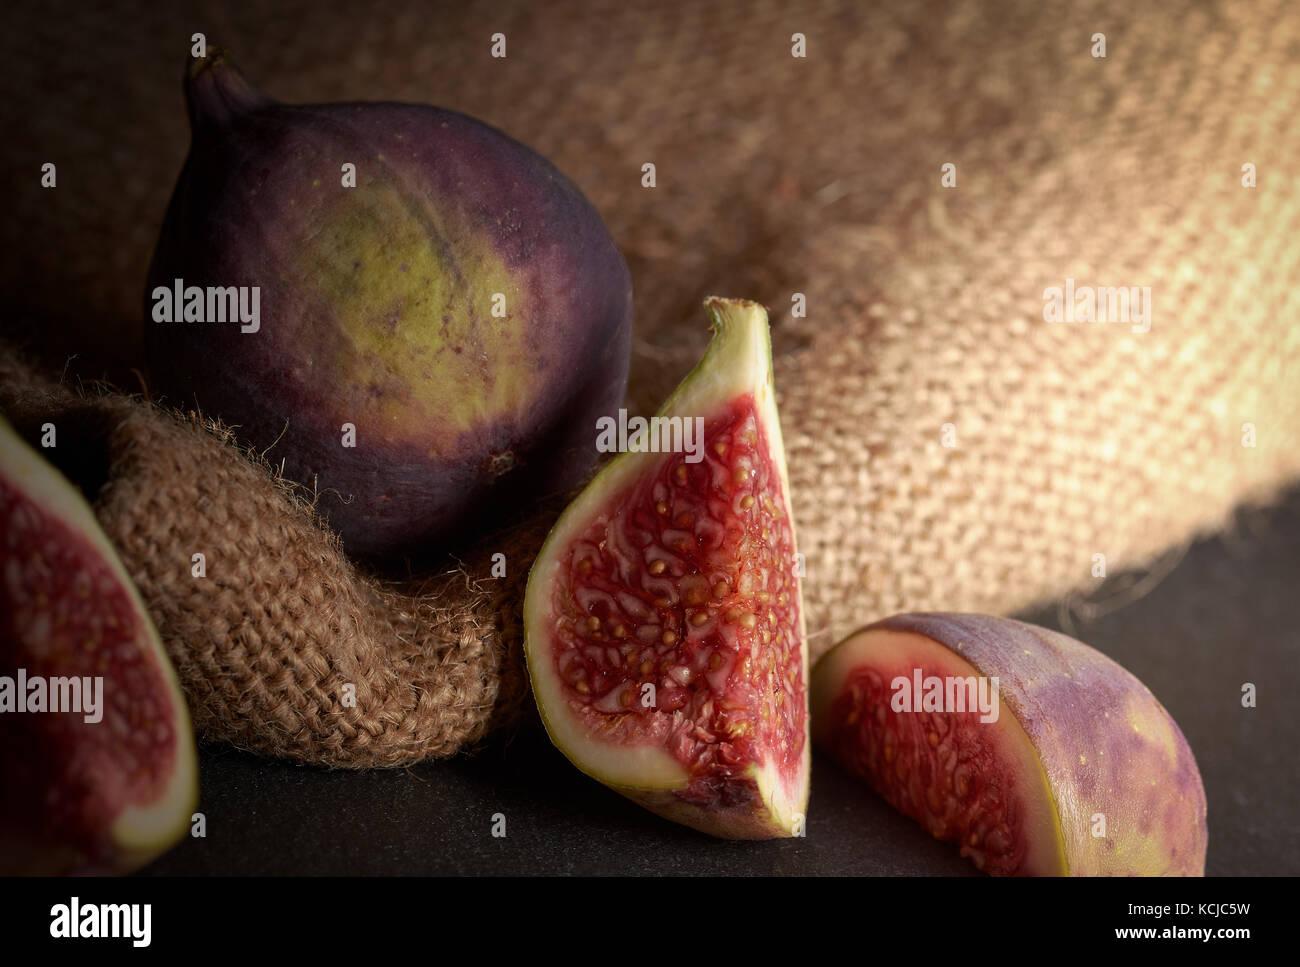 Fresh Figs - Stock Image